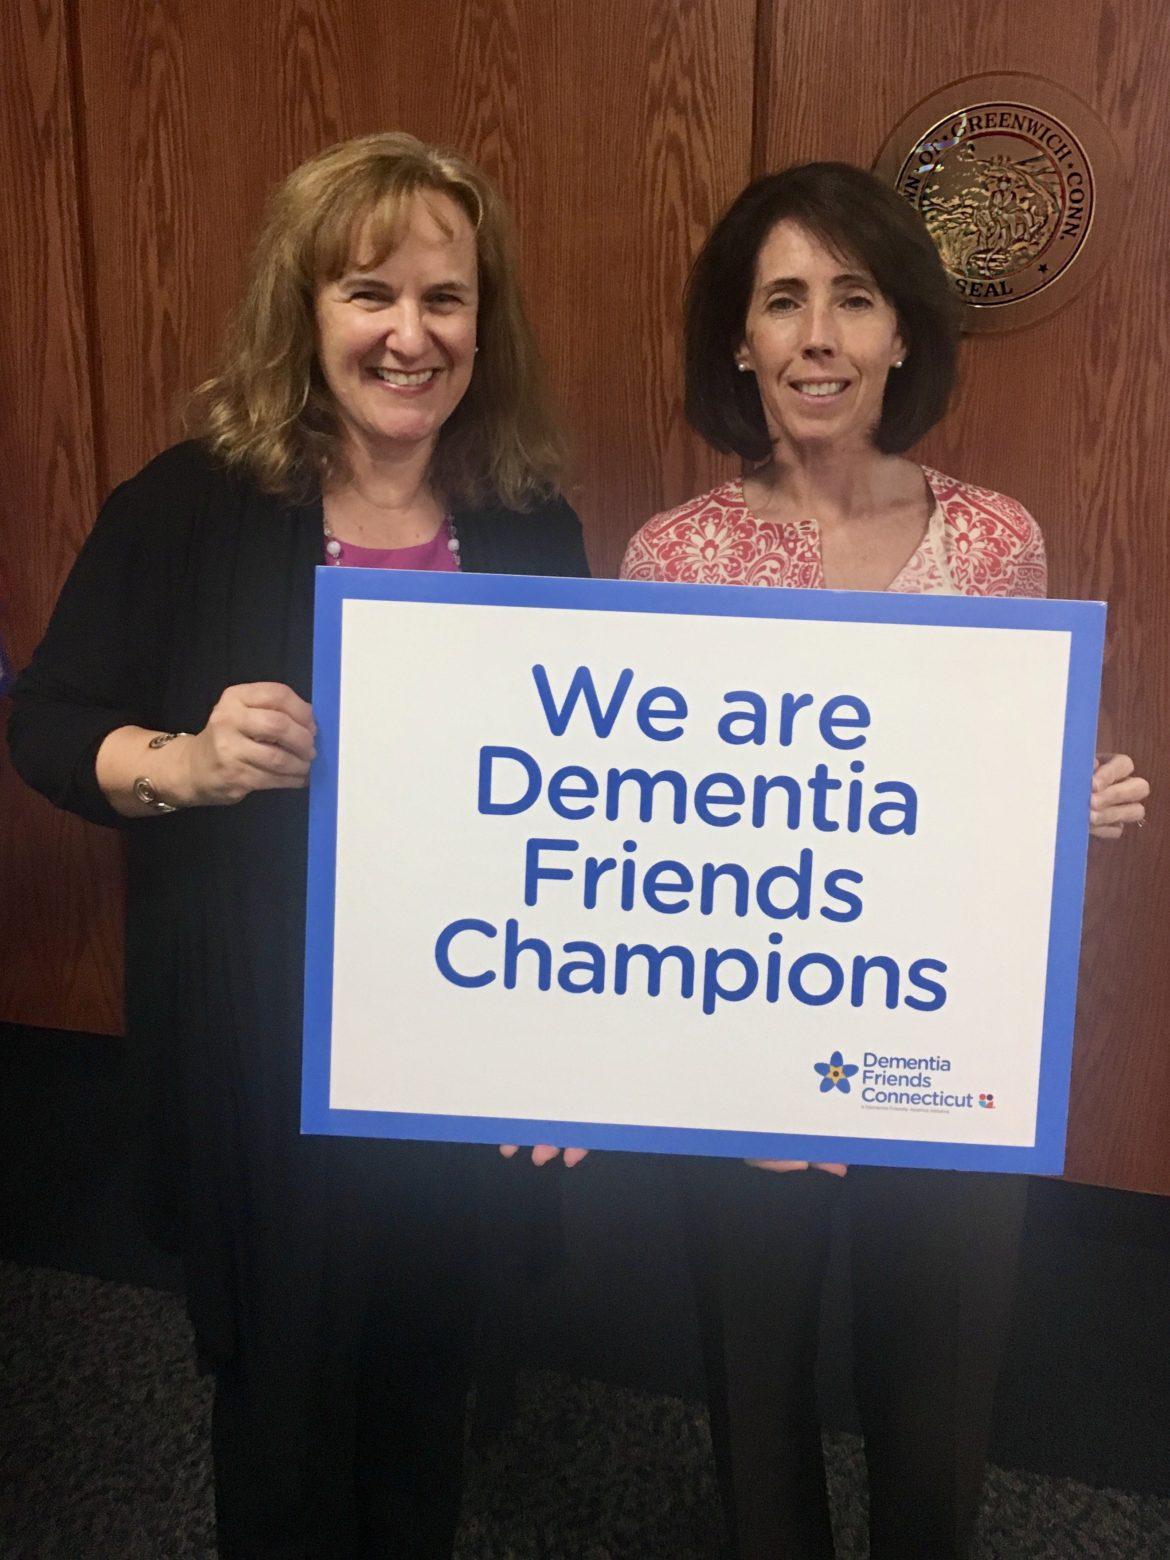 Dementia Friends Blum McGuire